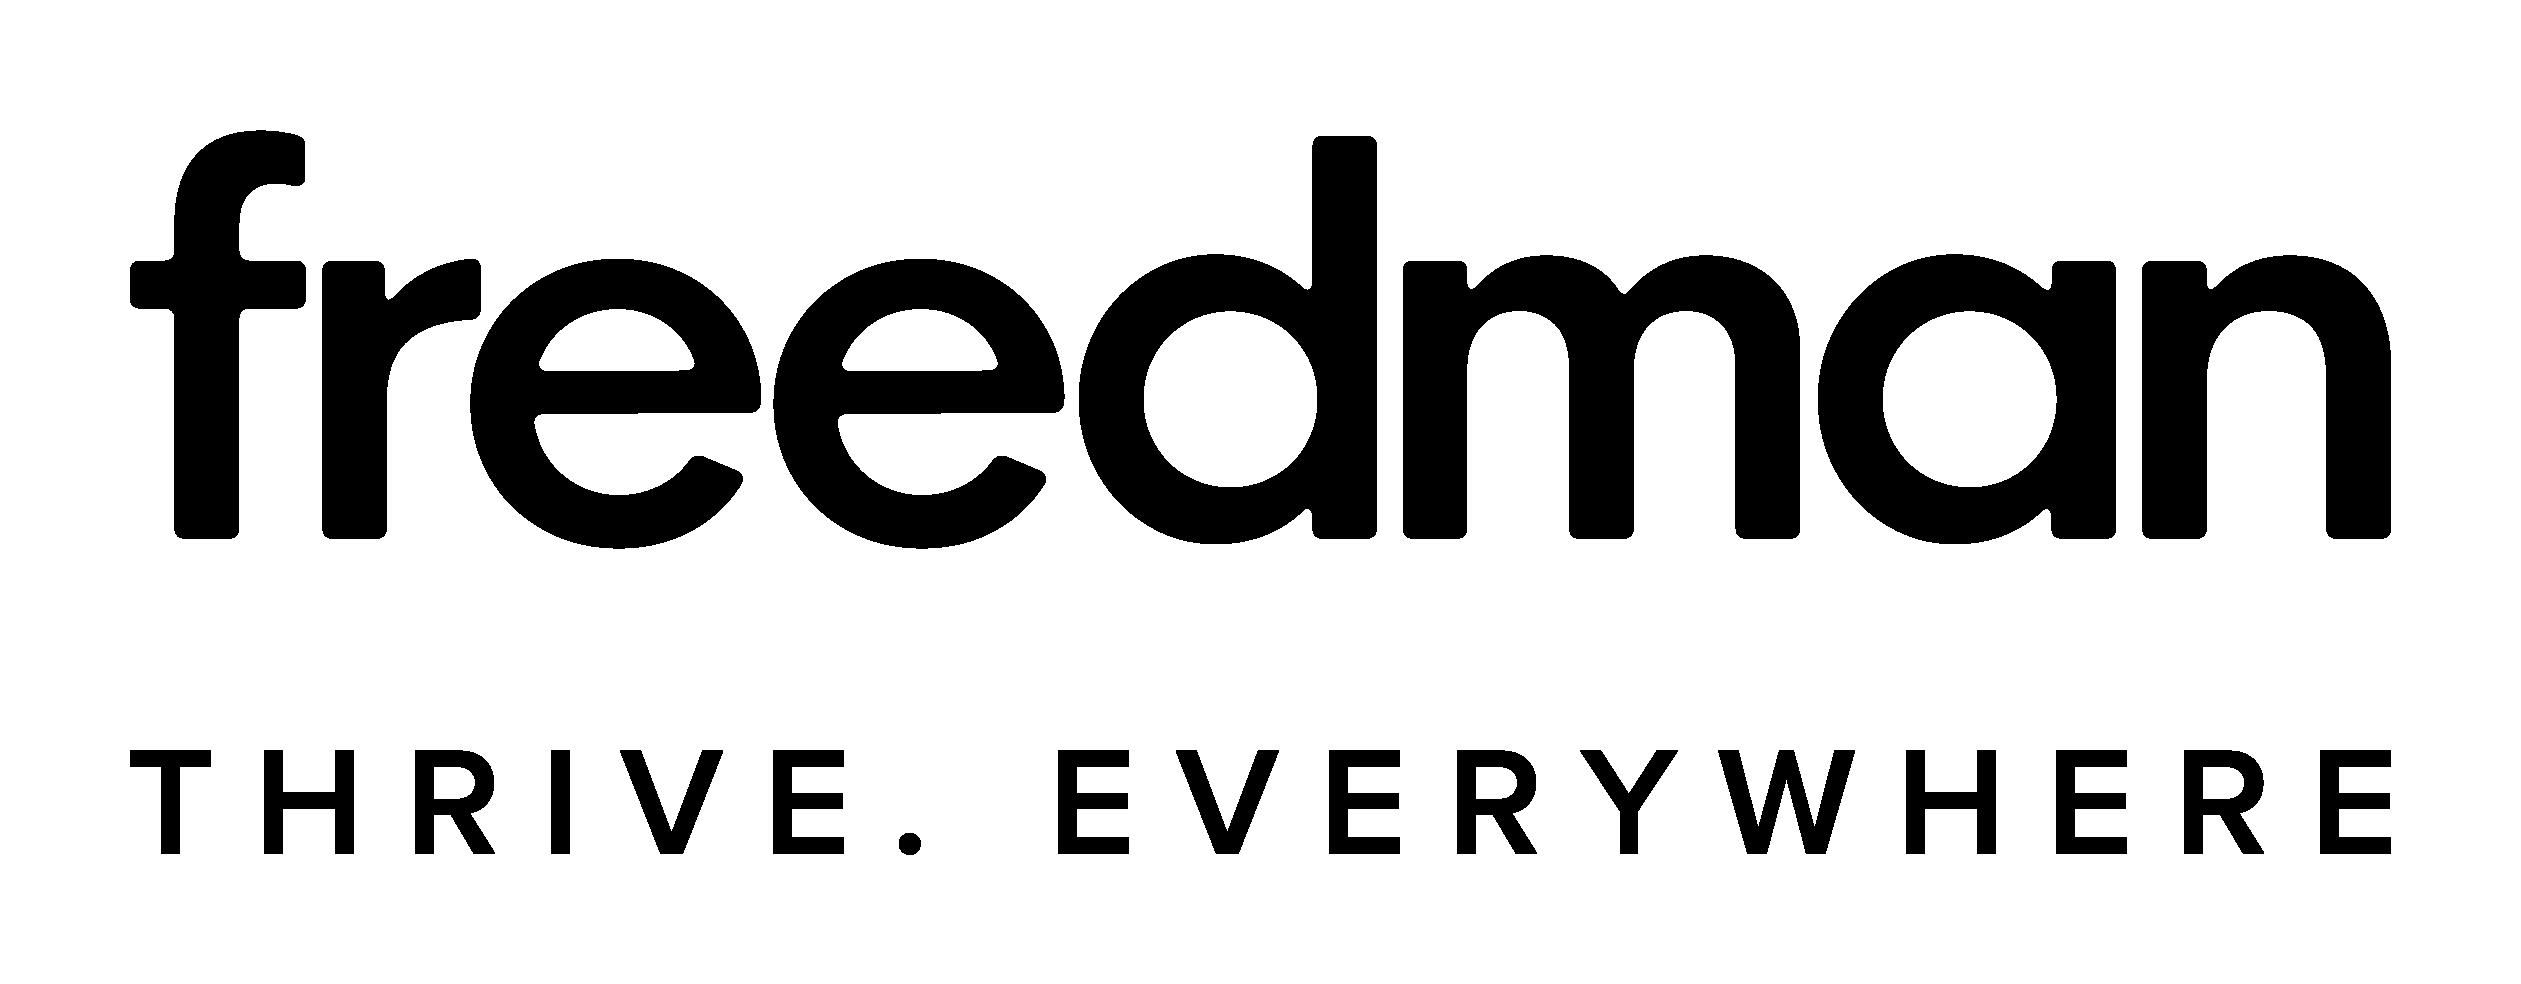 Freedman-2020-Logo&Tagline-01